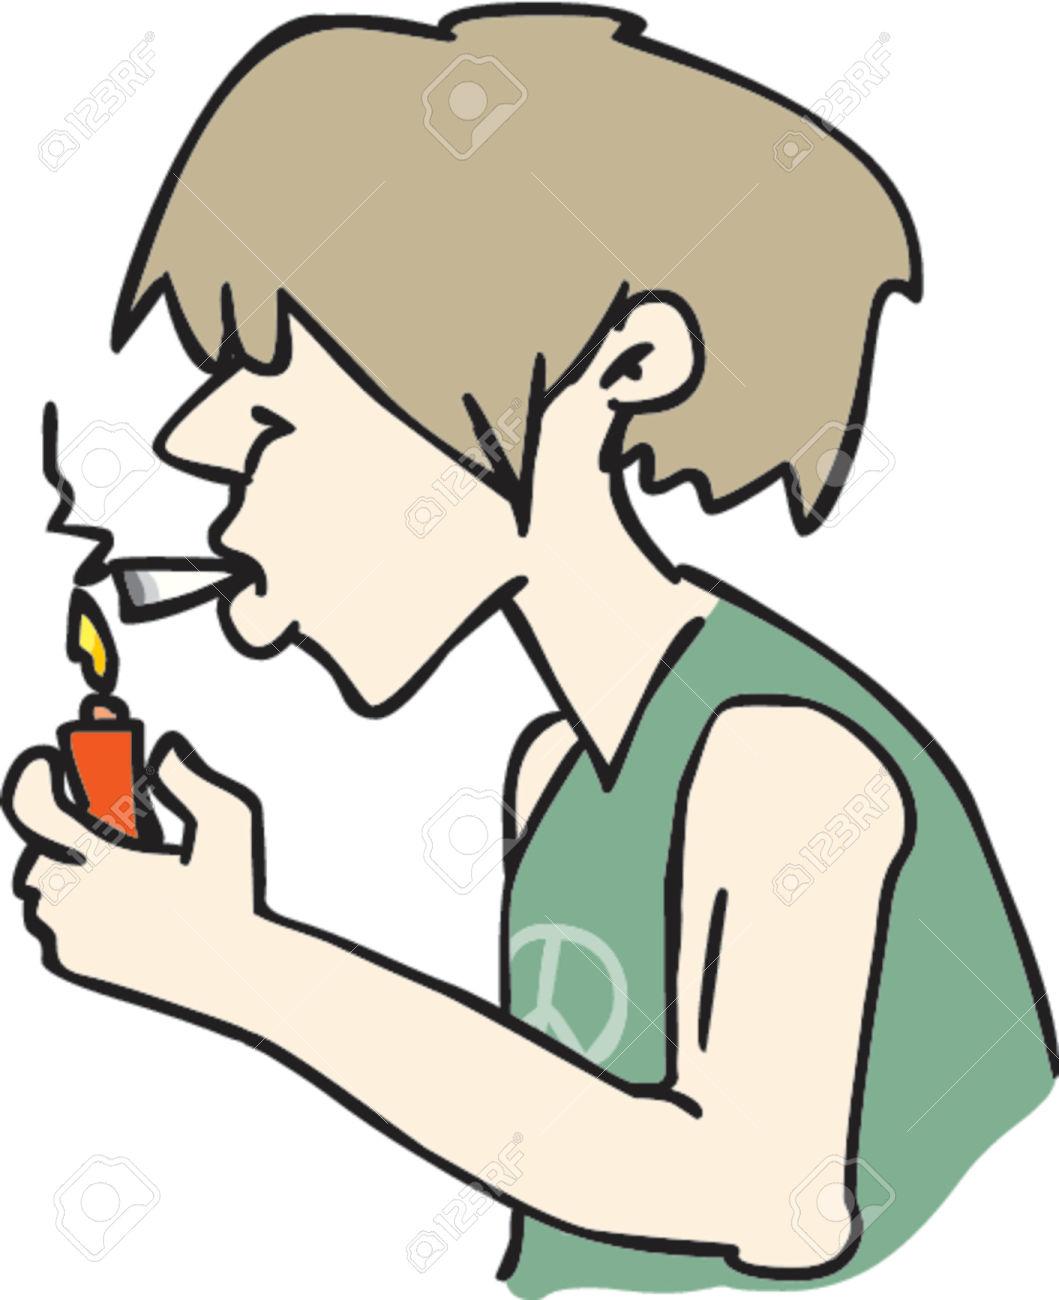 Smoking weed clip art